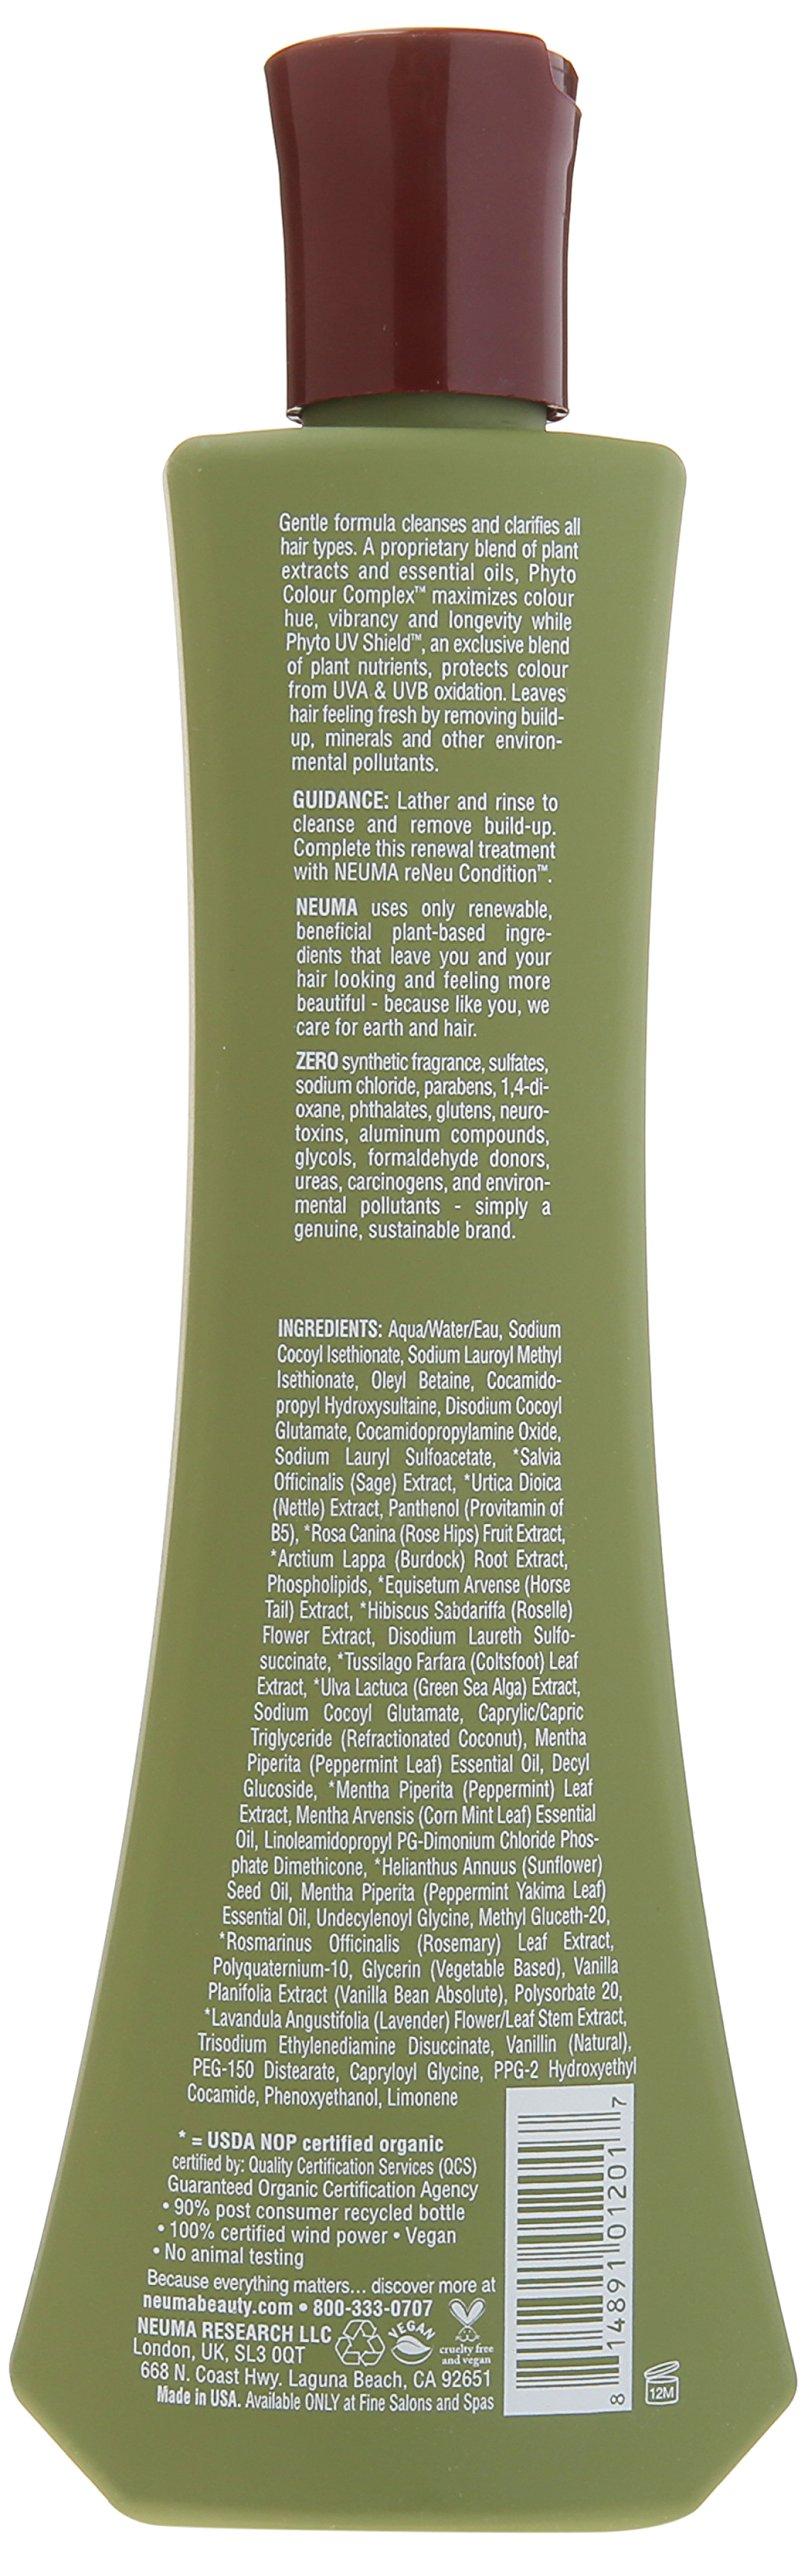 Neuma ReNeu Cleanse Shampoo, 10.1 Fluid Ounce by Neuma (Image #1)